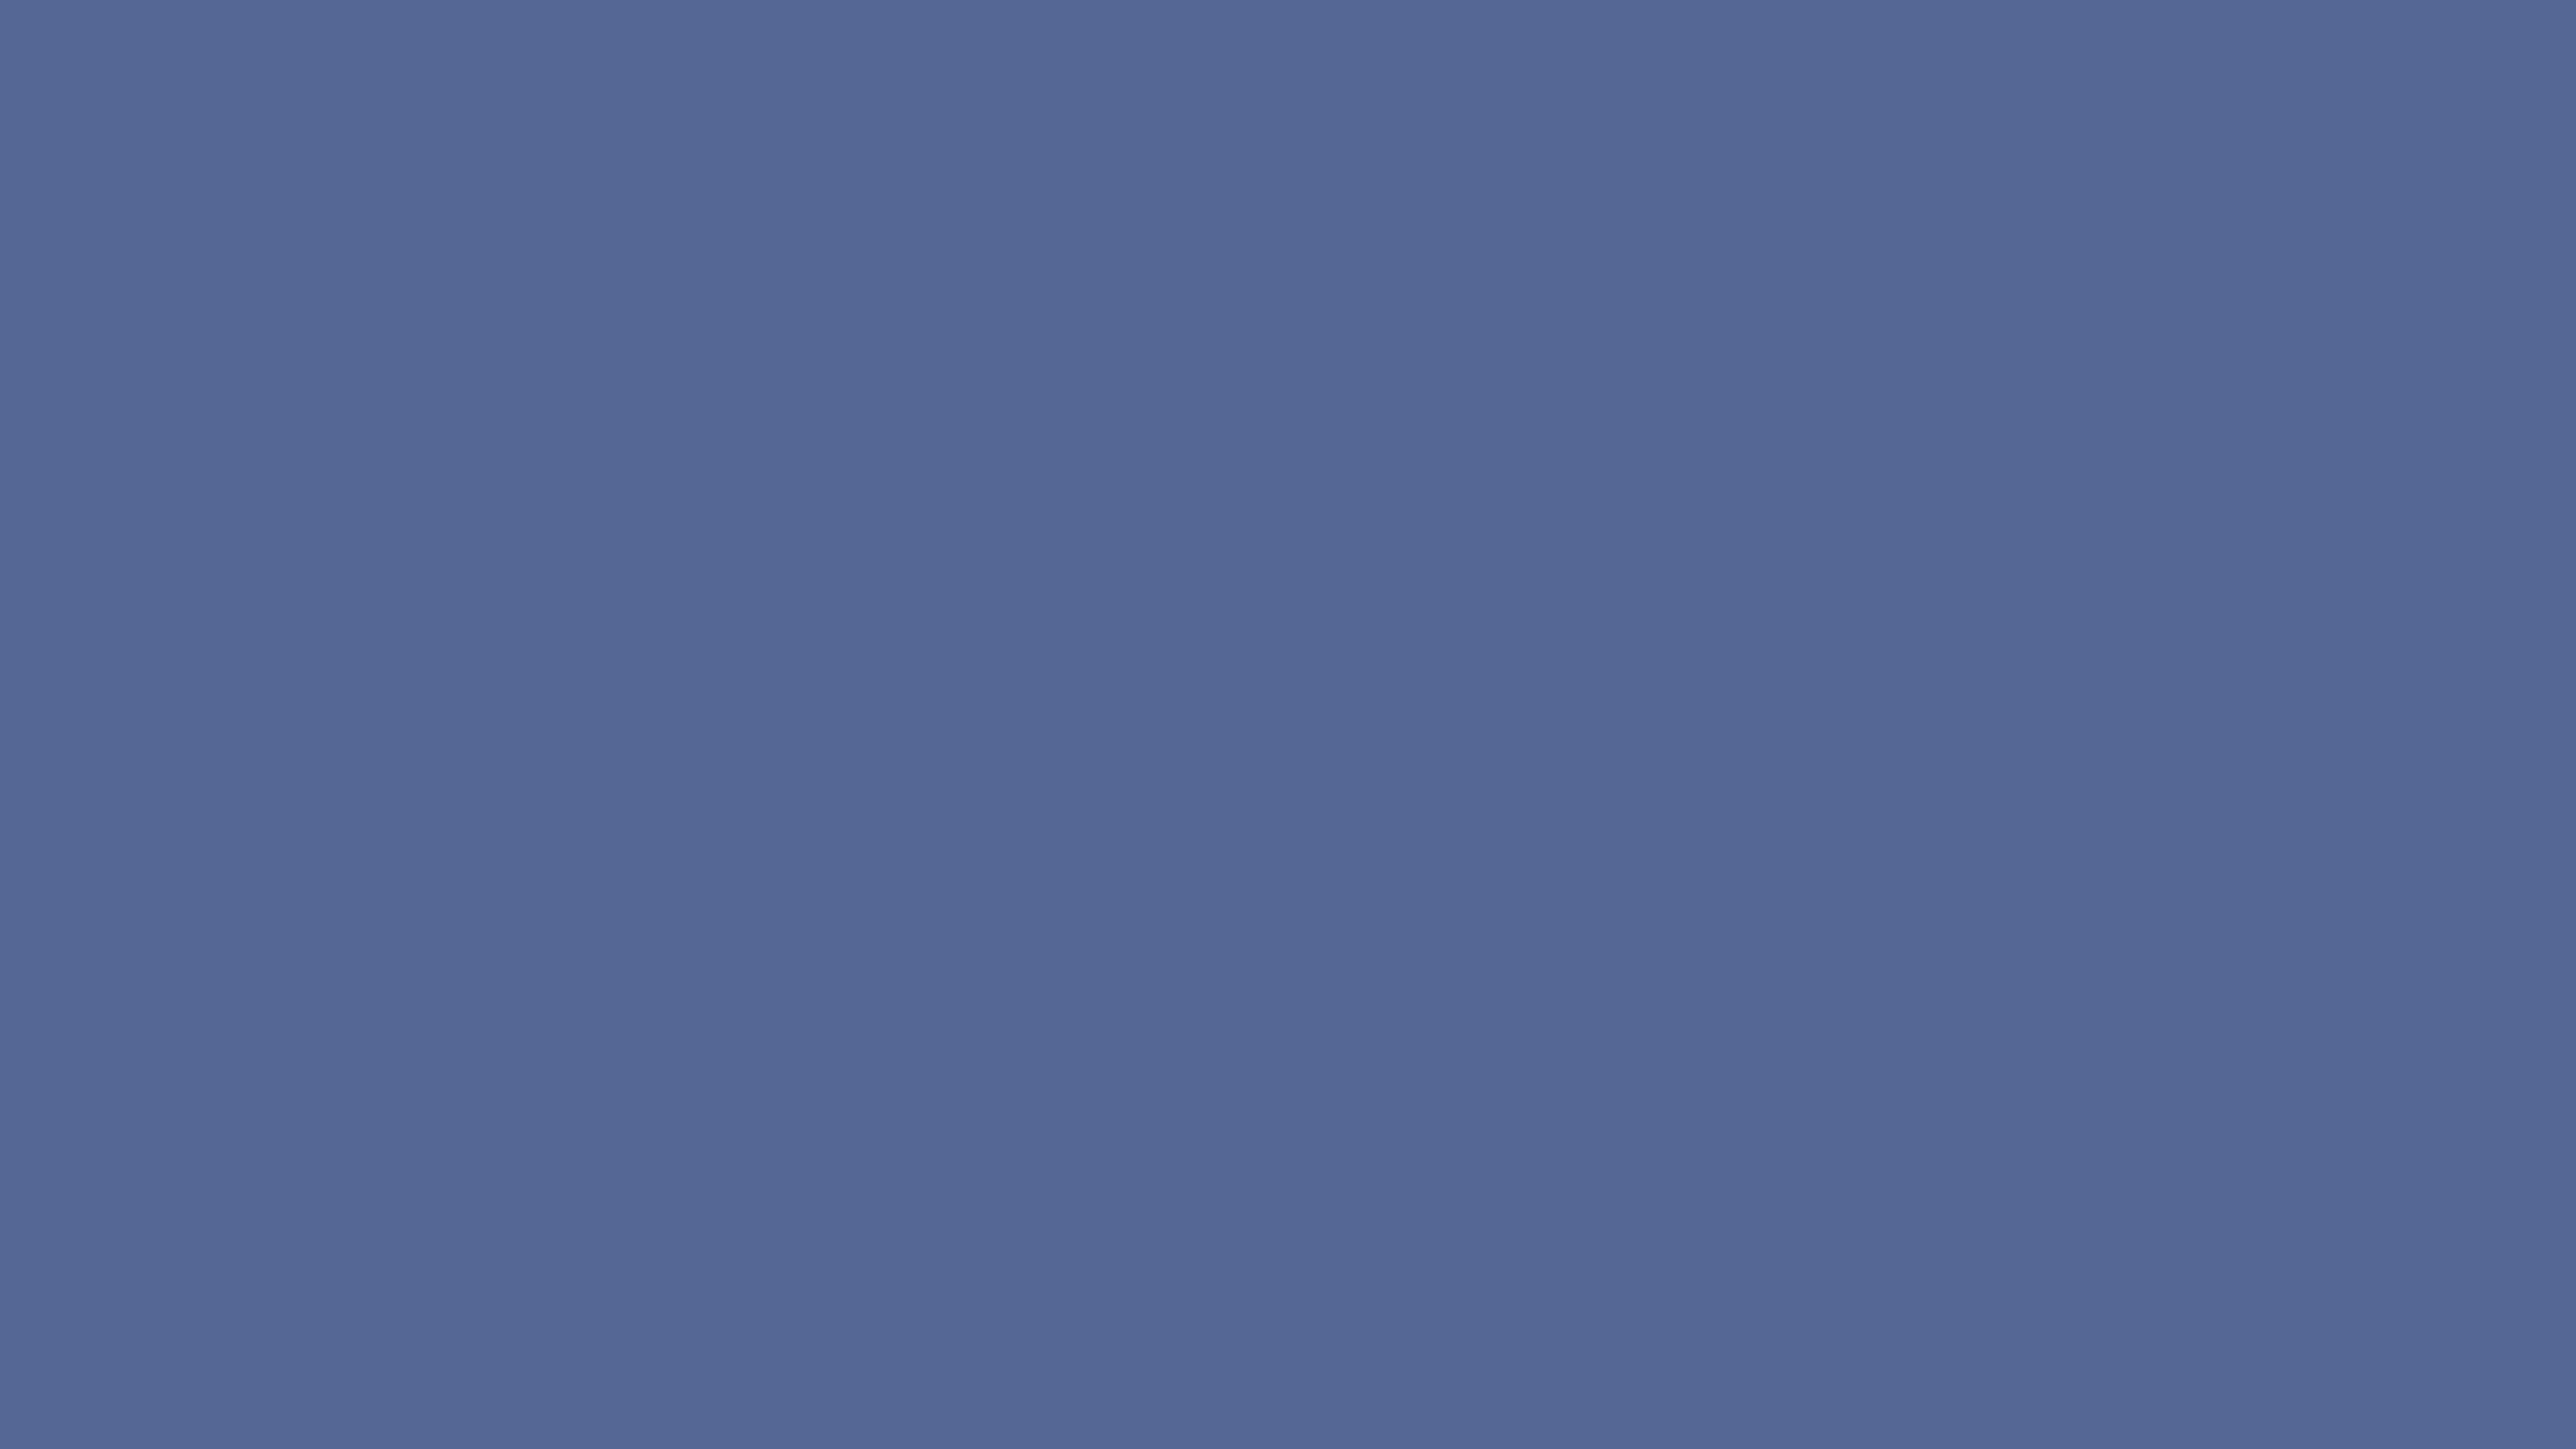 3840x2160 UCLA Blue Solid Color Background